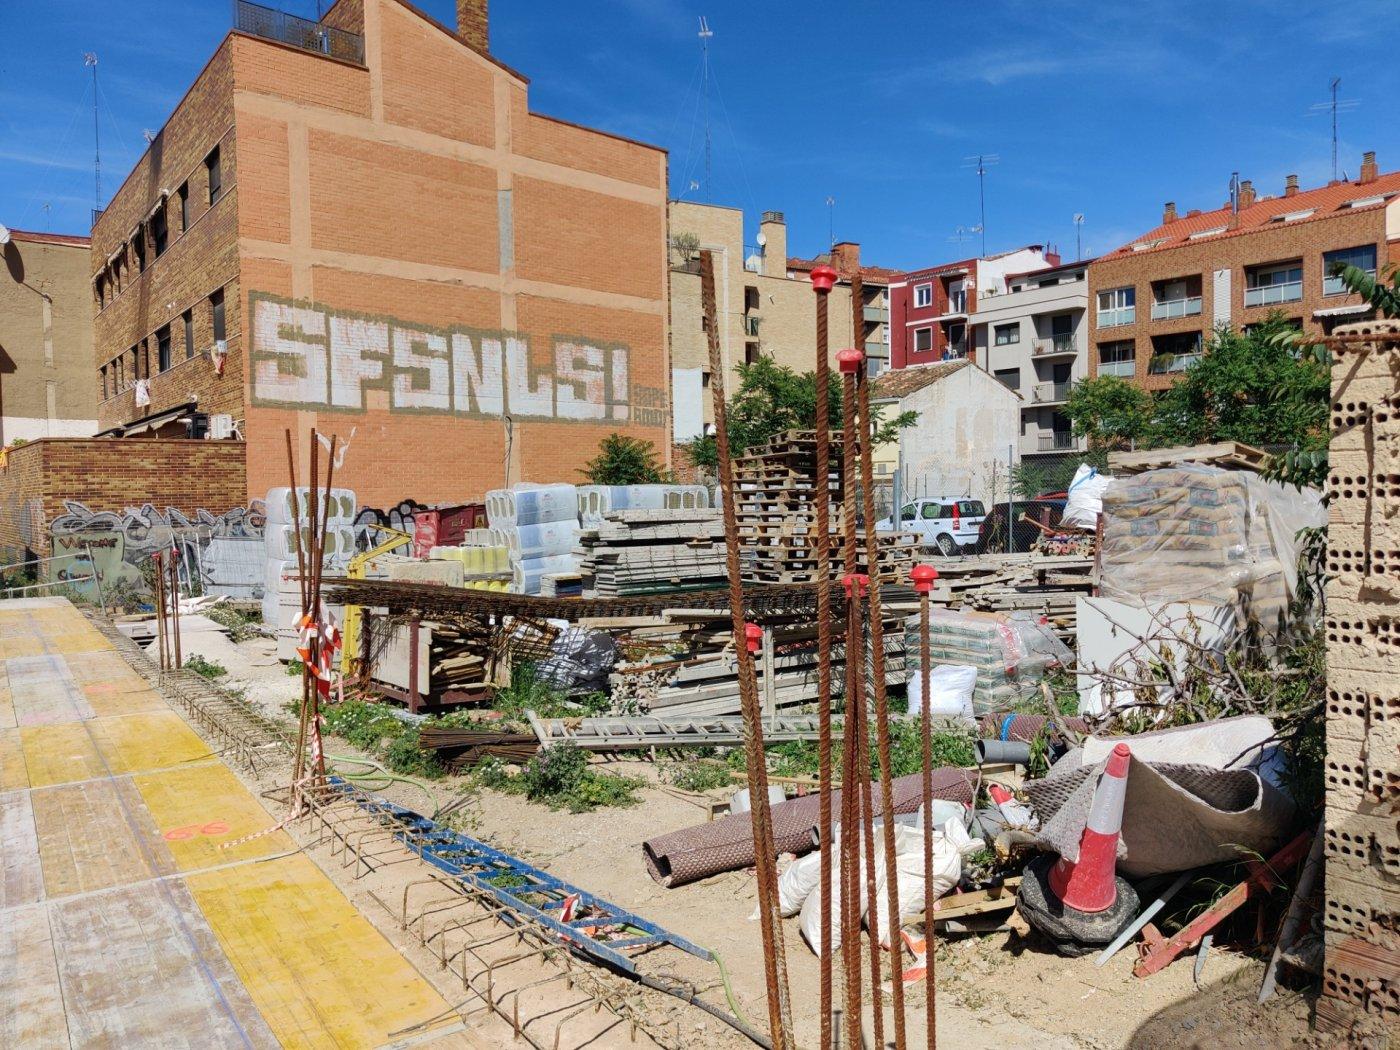 Terreno Urbano · Zaragoza · San Jose 1.700.000€€